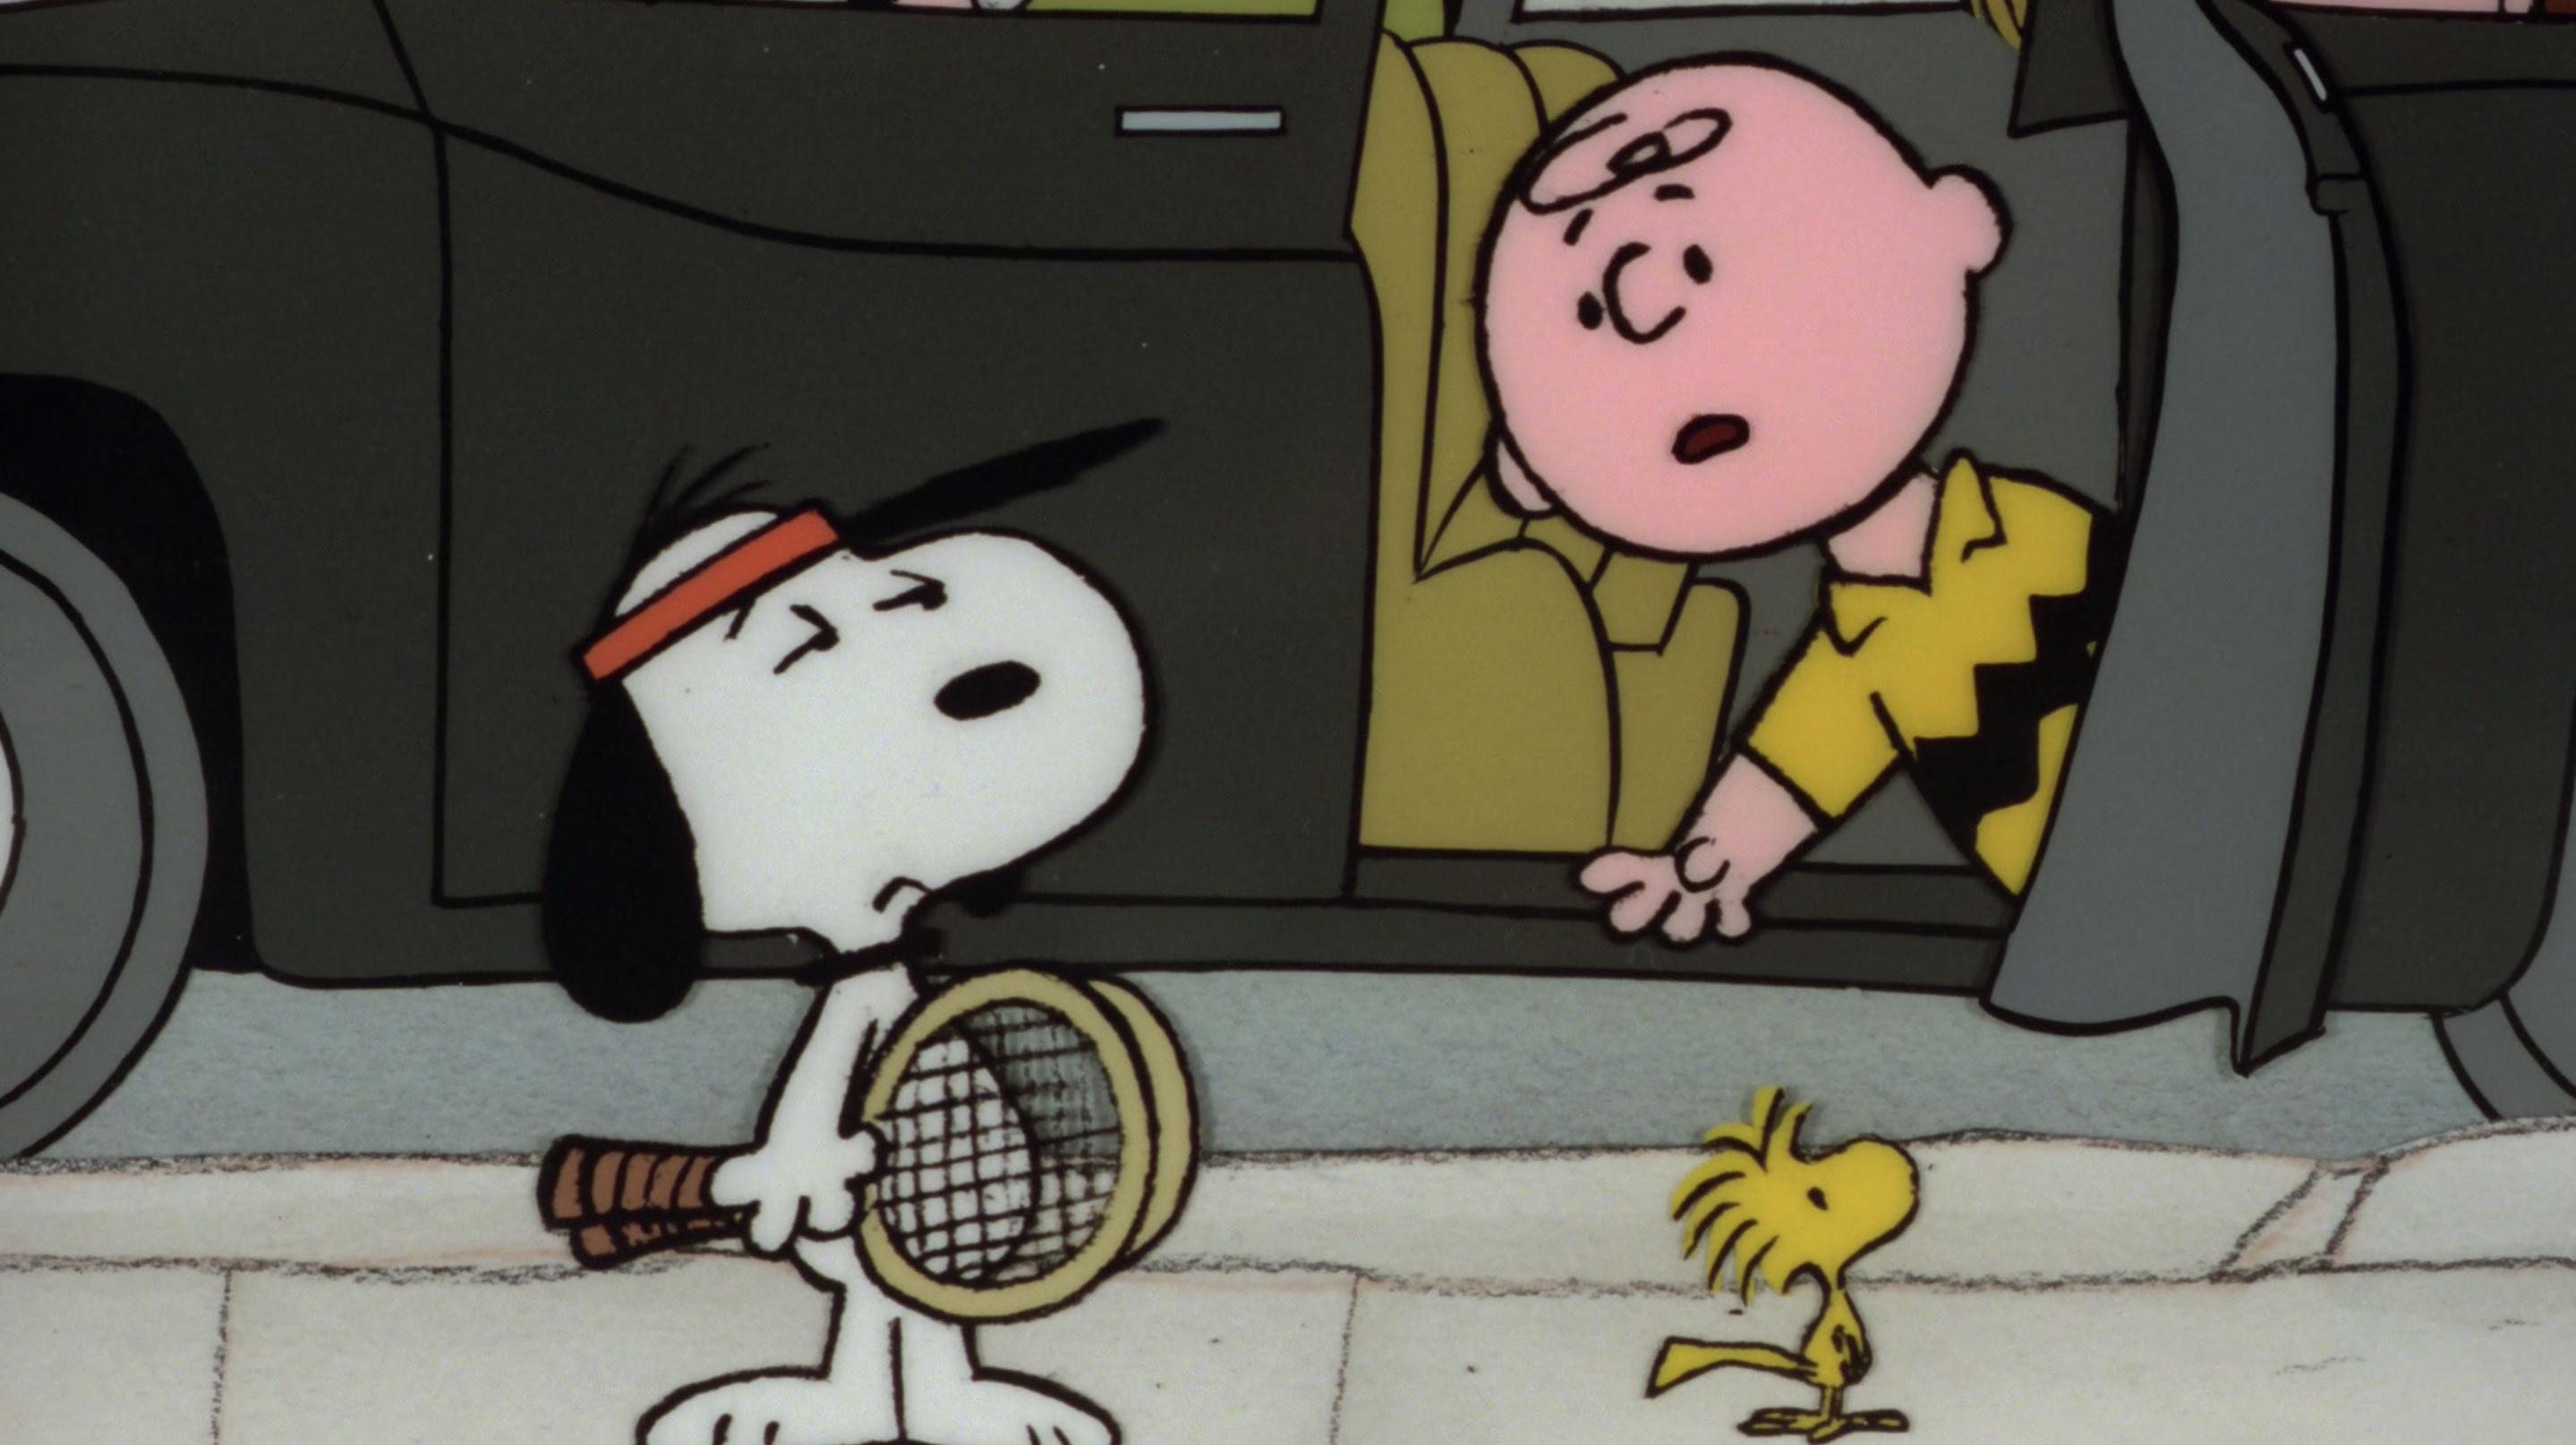 File:Snoopytennis.jpg